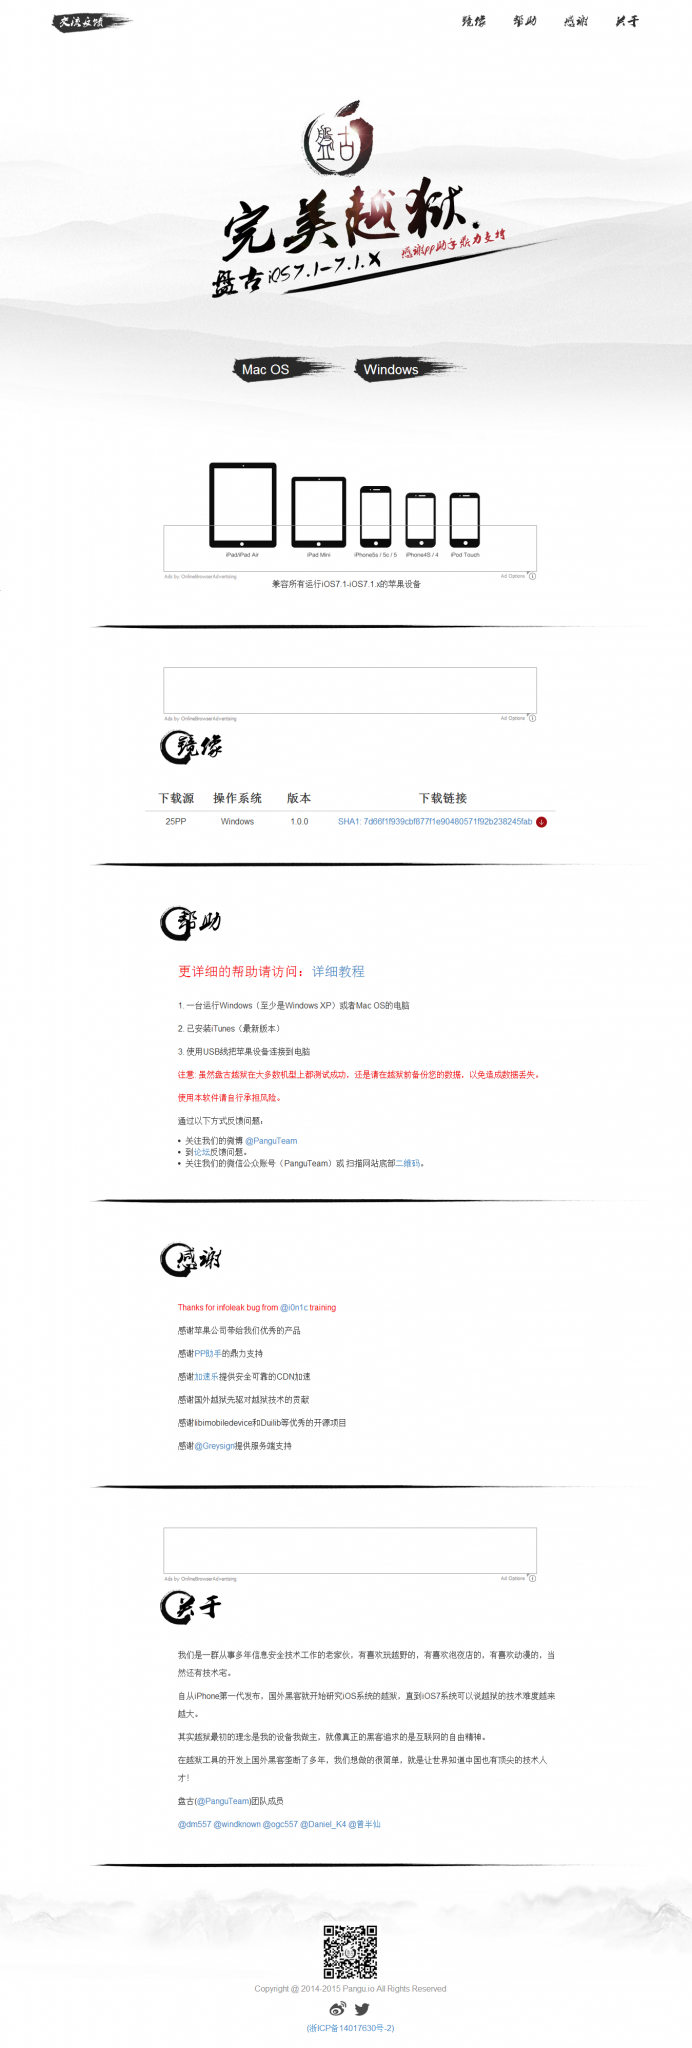 Pangu越狱工具 Pangu.io  - iOS 7.1.1 Jailbreak now available